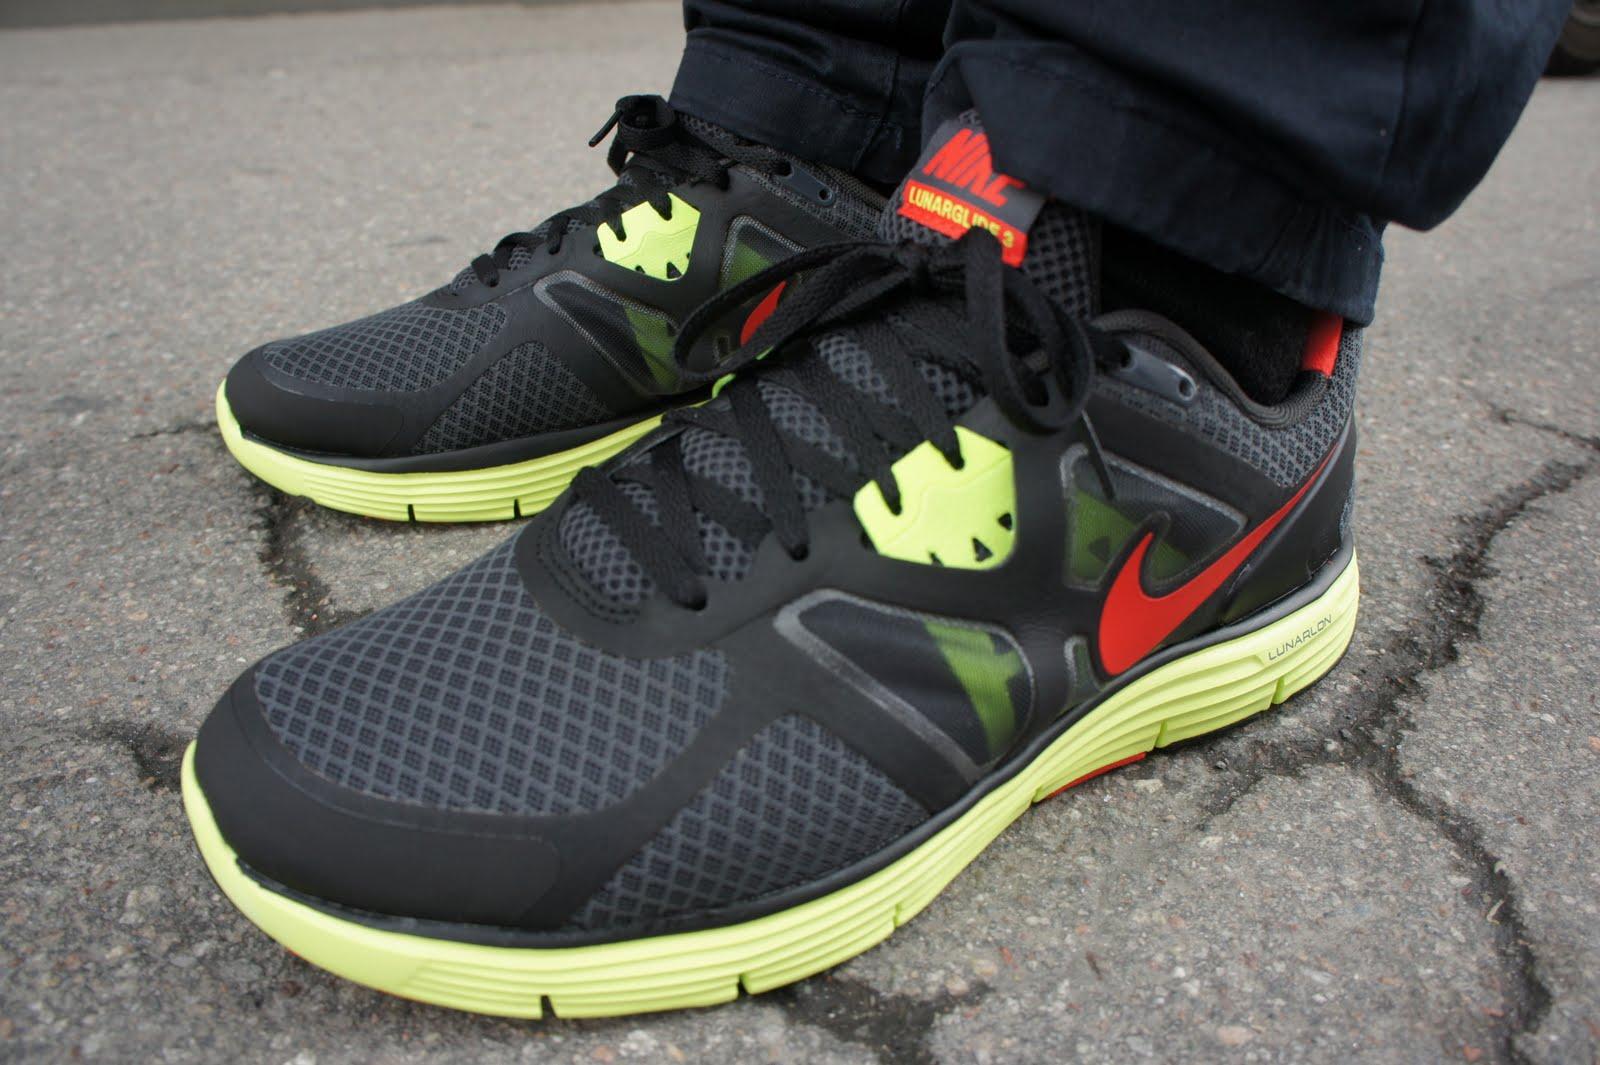 Nike Lunarglide 3 Black Six Feet Down: ...